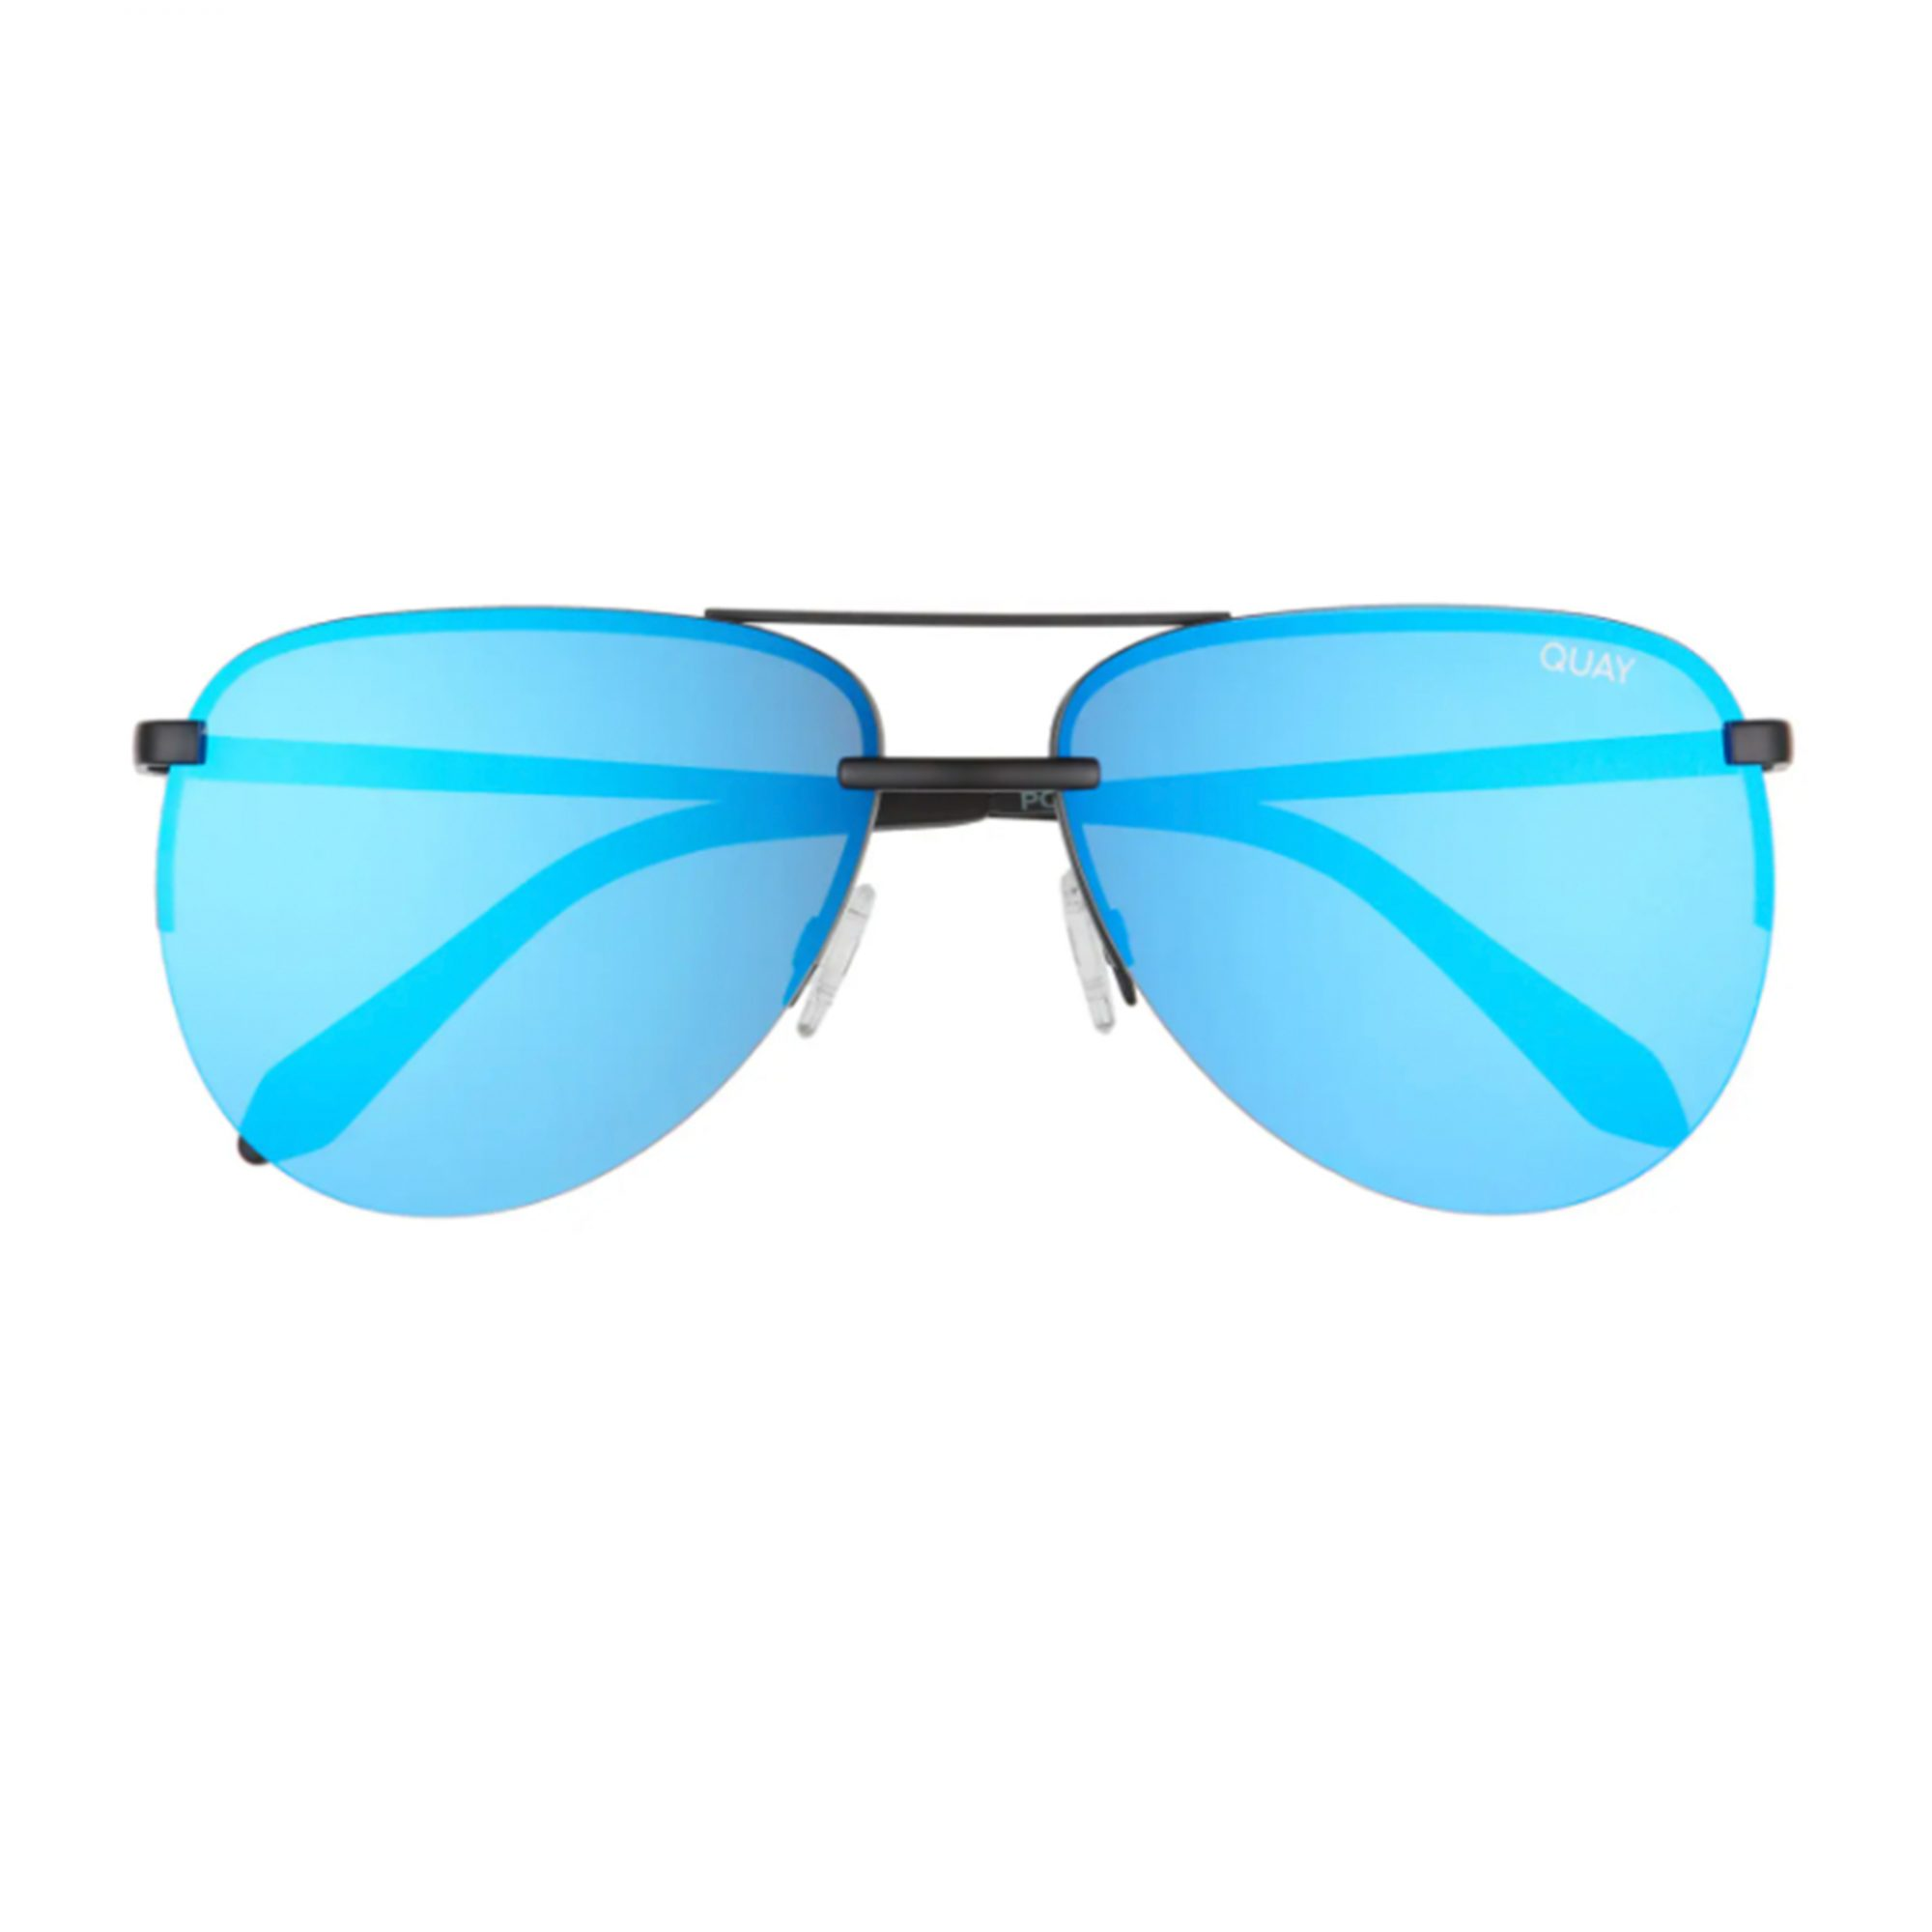 quay-maluma-aviator-sunglasses